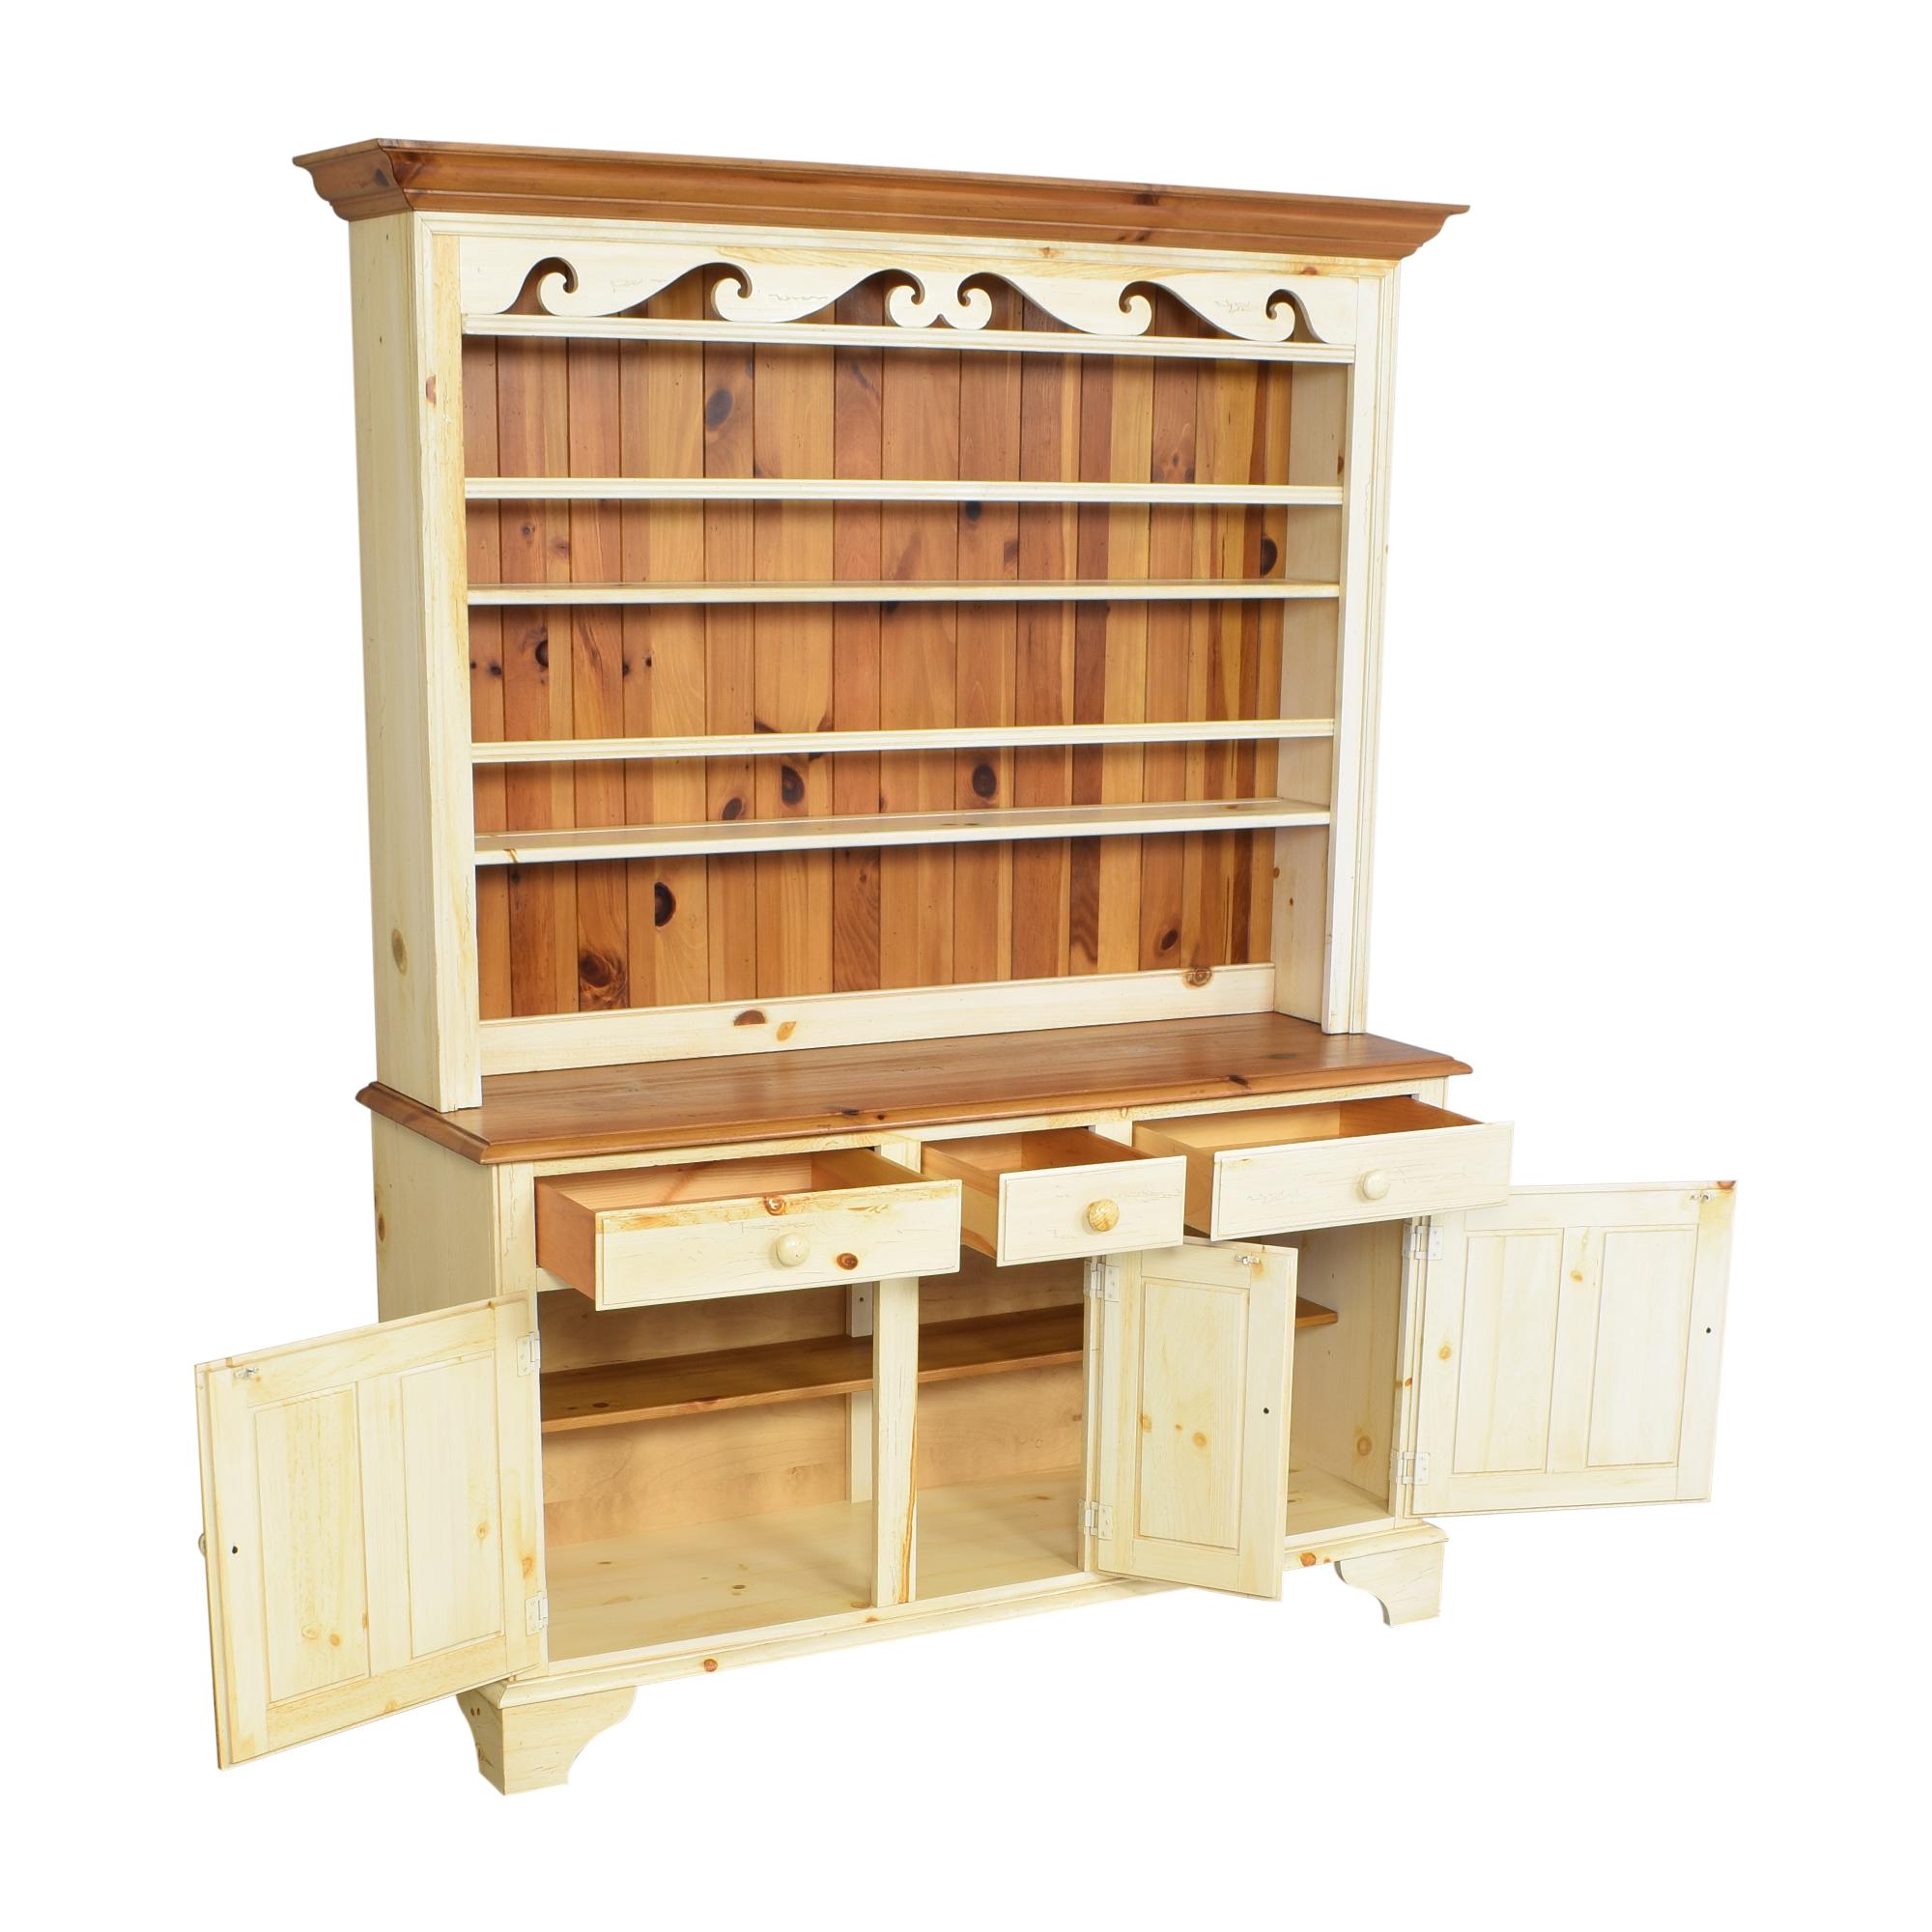 Ethan Allen Ethan Allen Farmhouse Cabinet with Hutch ct